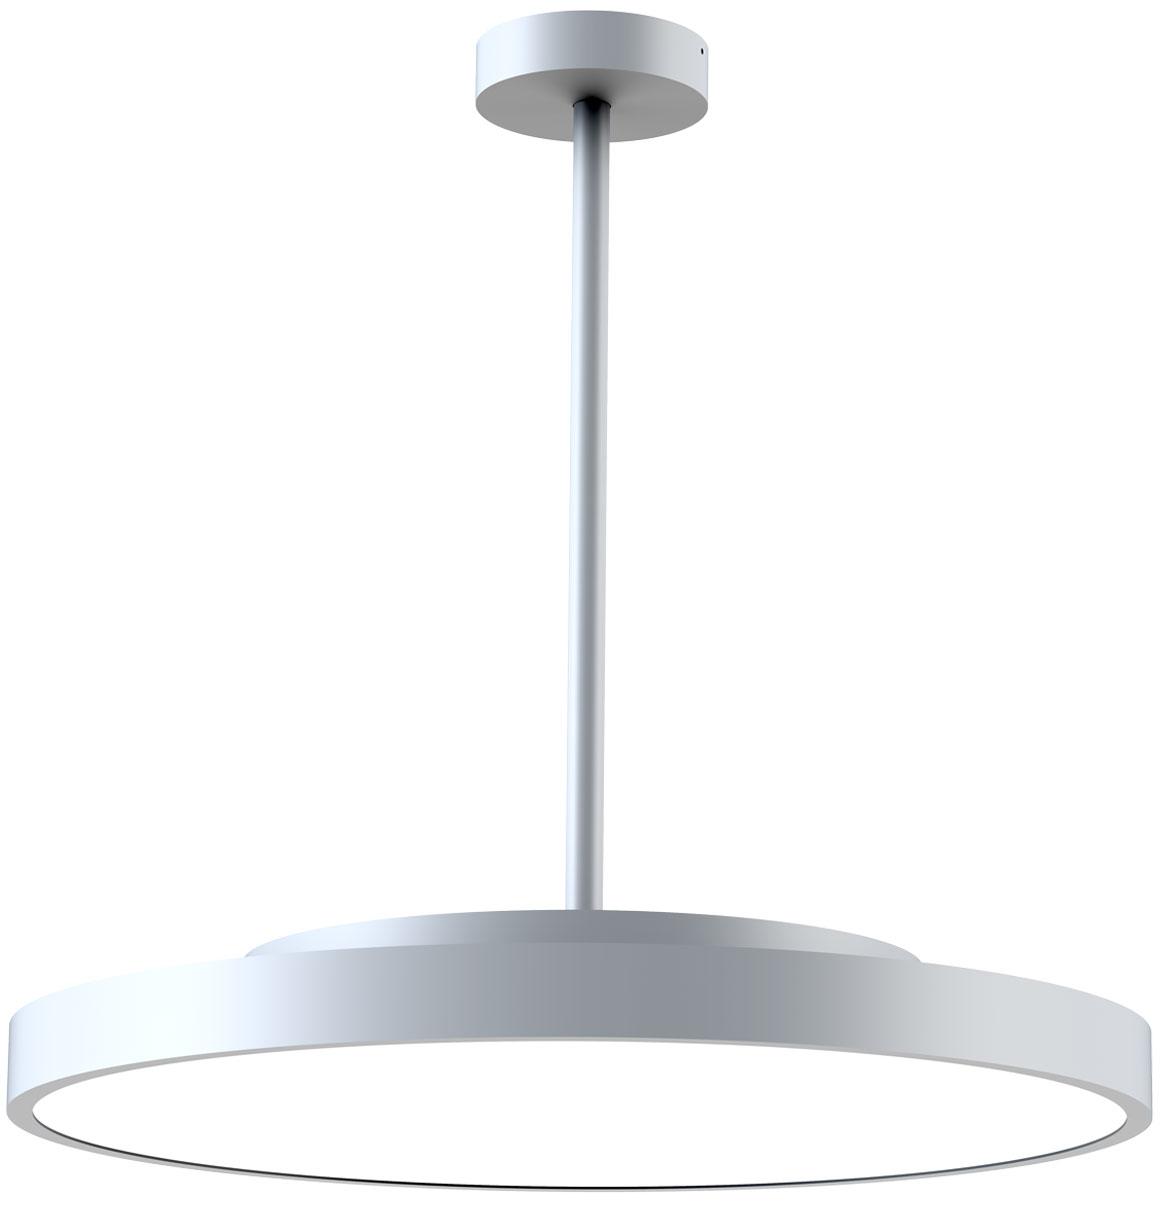 LEDAXO LED-Pendelleuchte PL-14 silber mit Pendelrohr